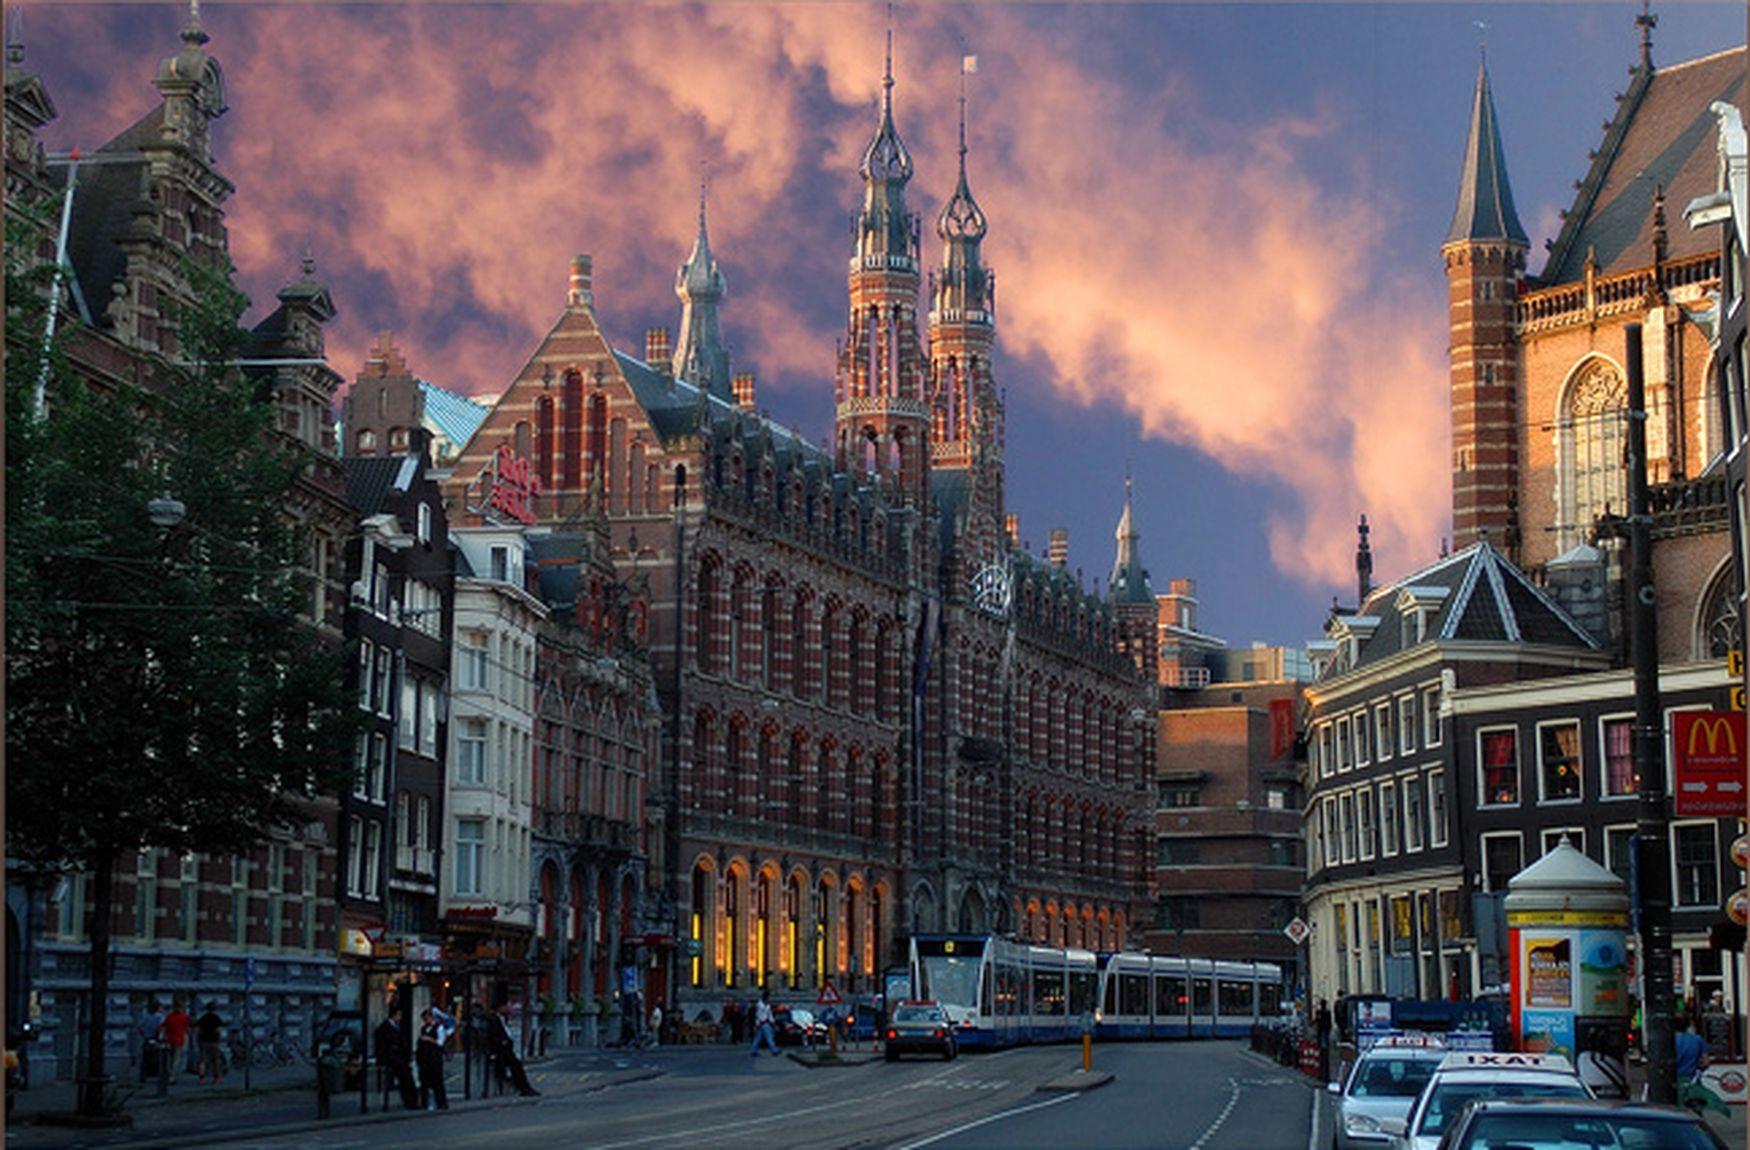 Jak dojechac autokarem do Holandii